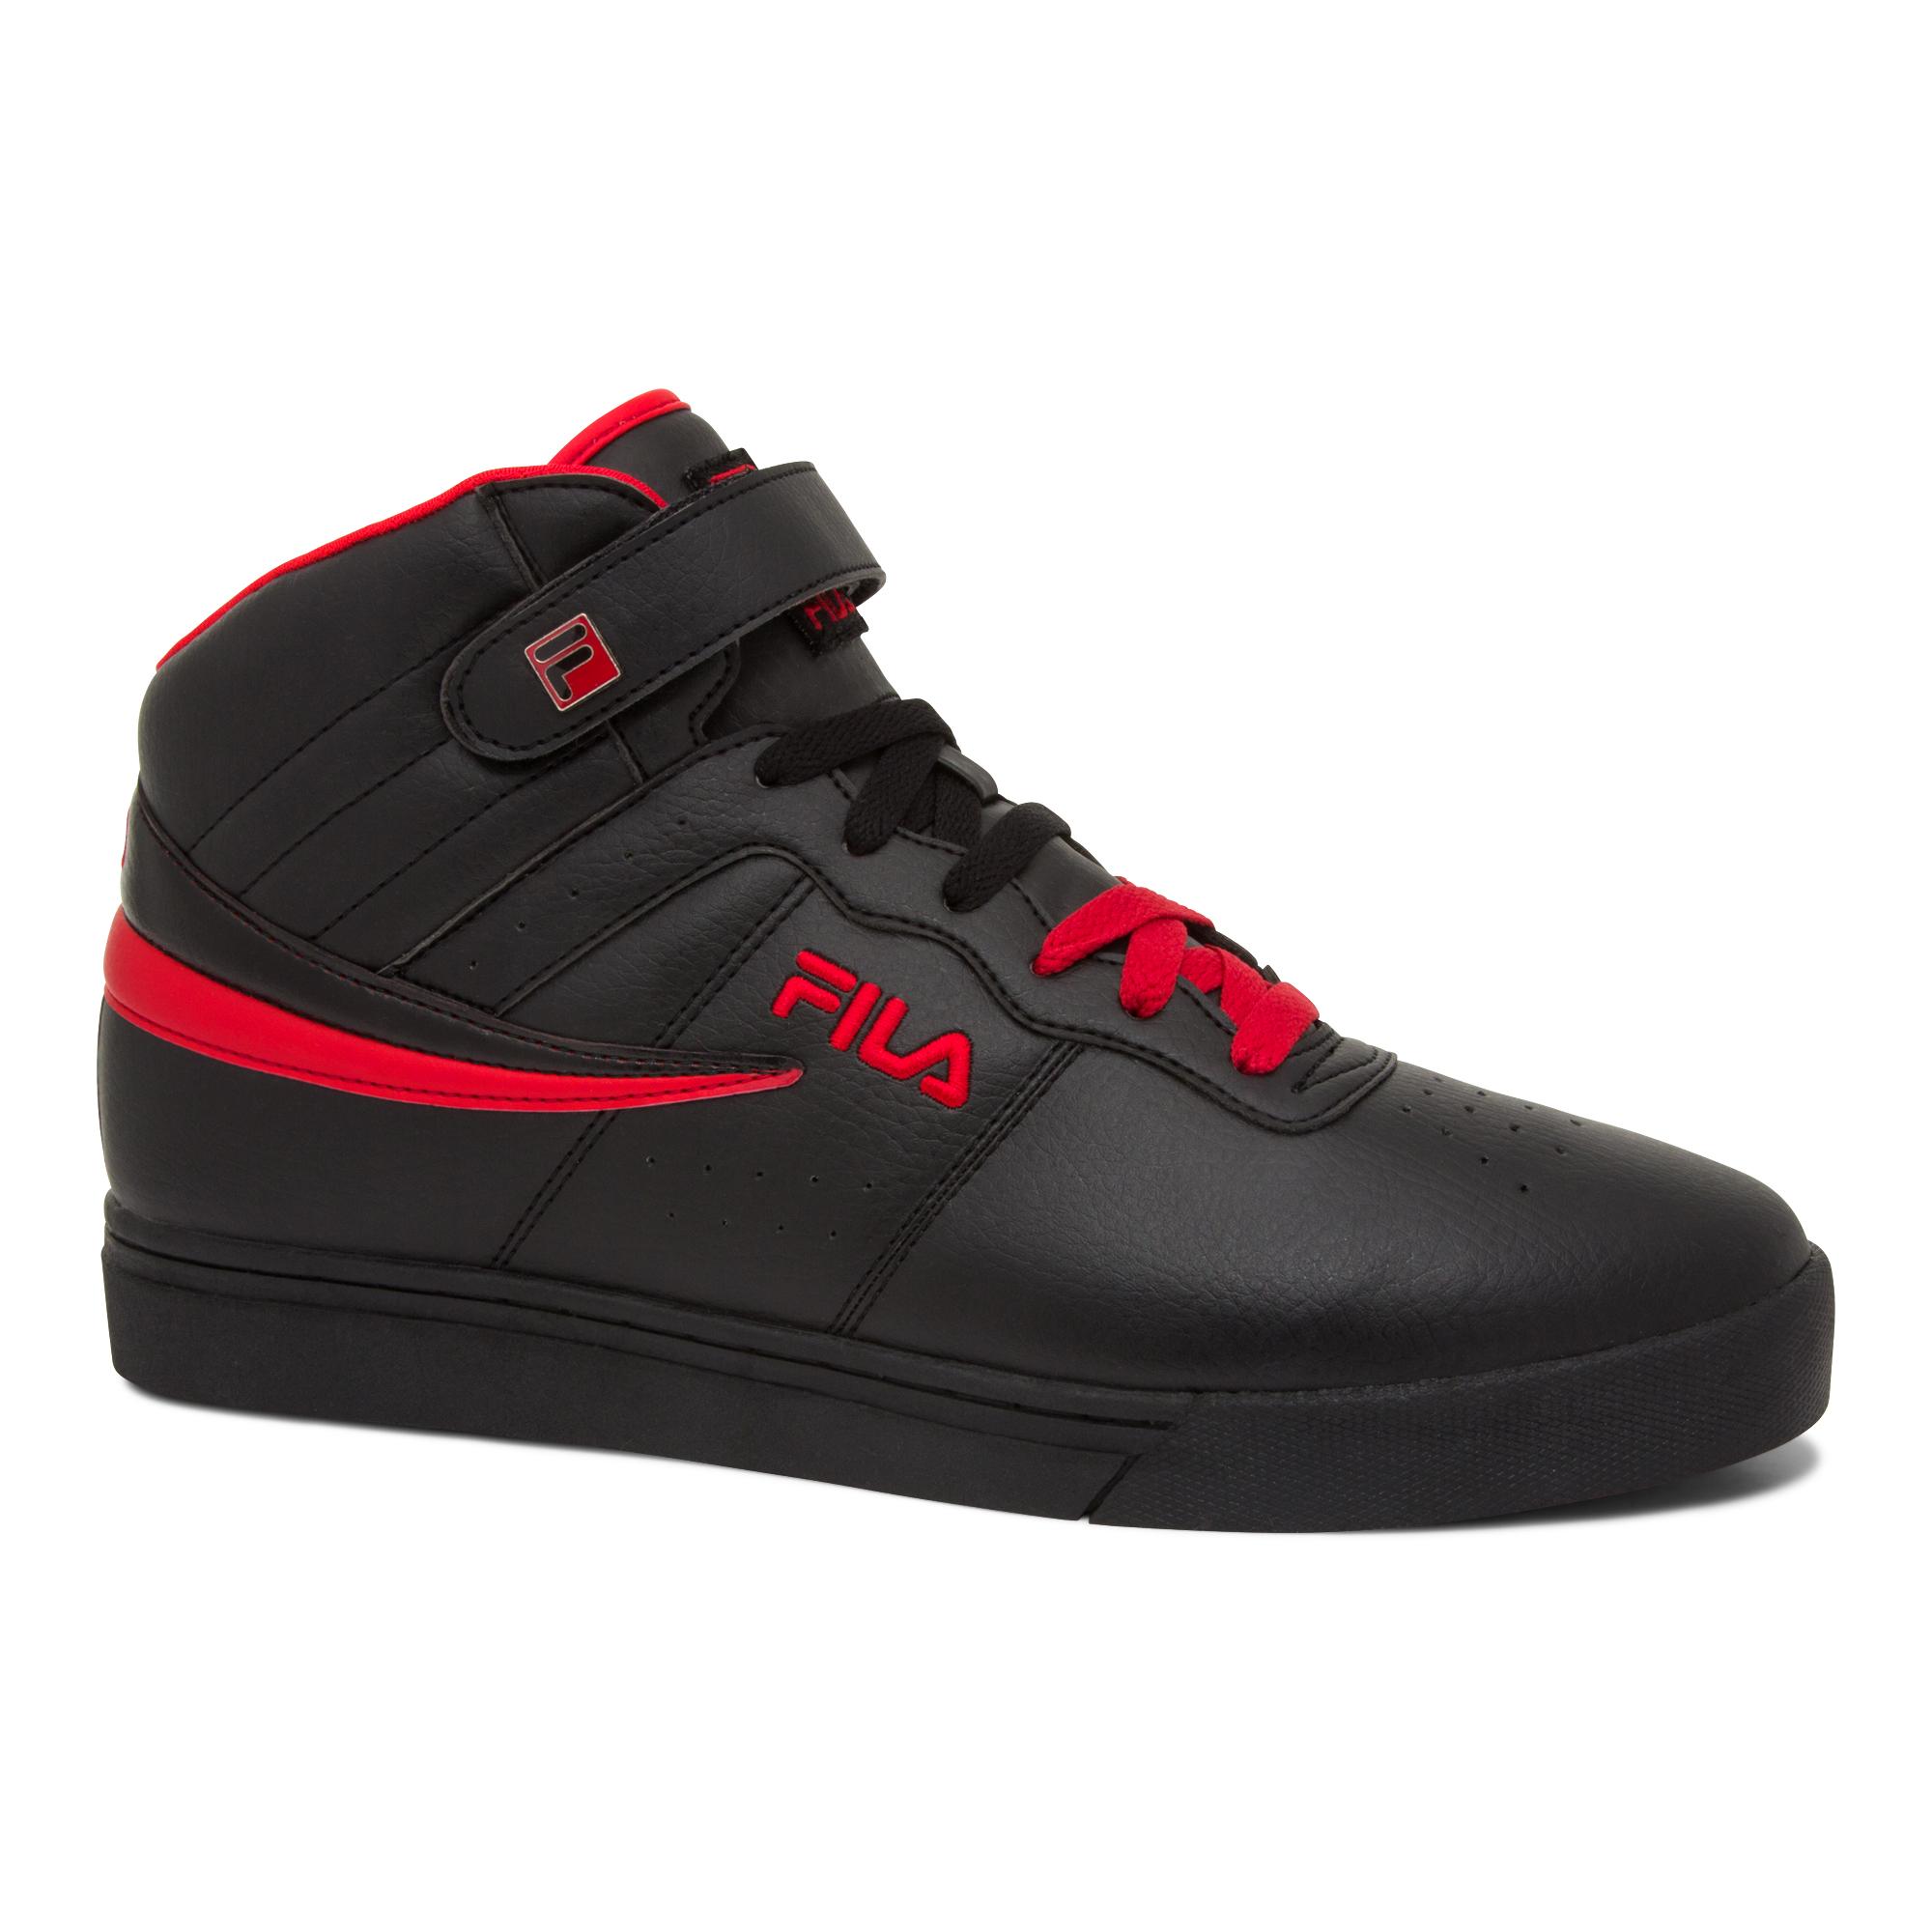 FILA® Vulc 13 Mid Men's ... Sneakers zu4RGja